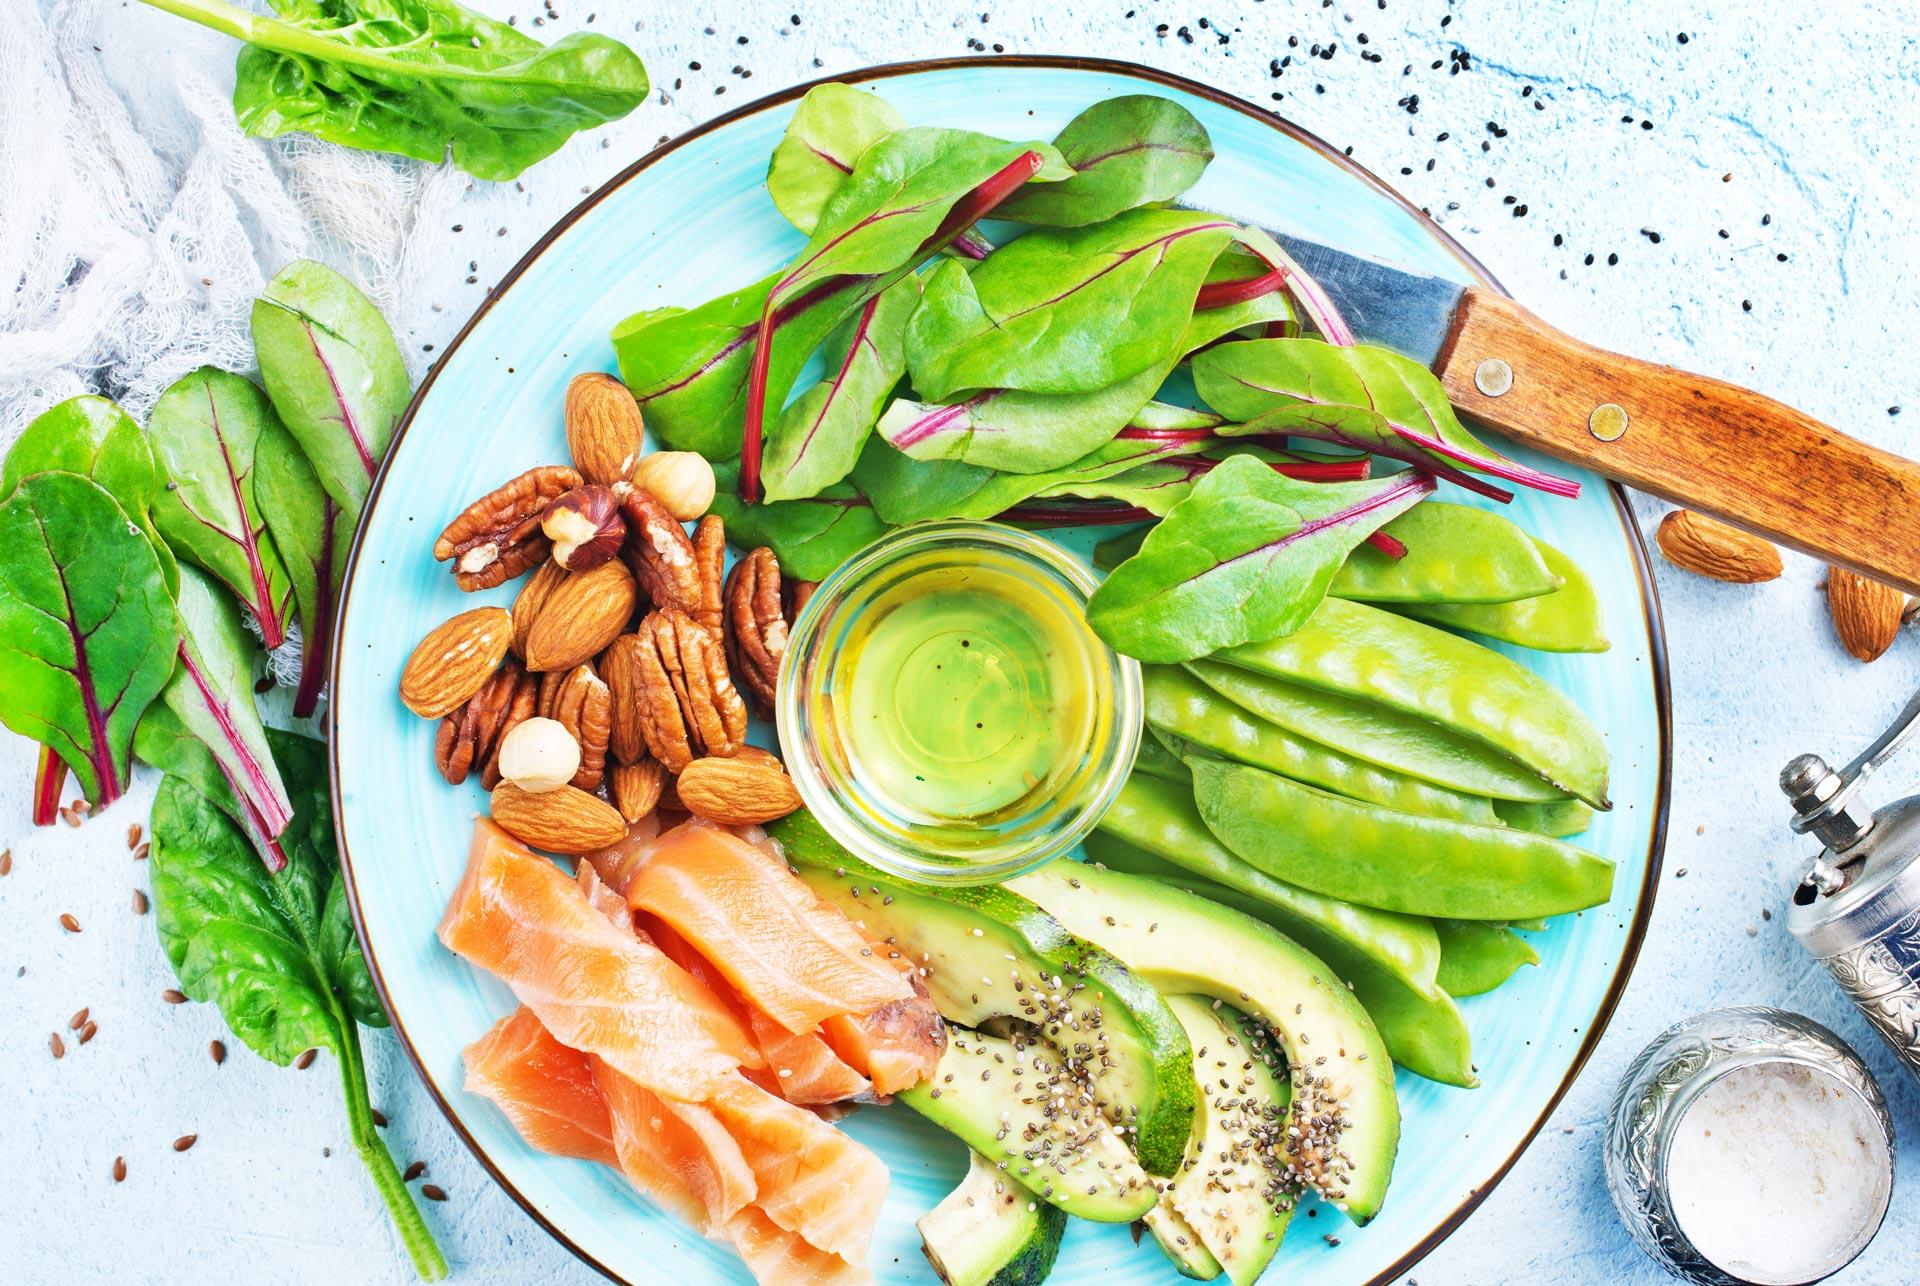 Plate of healthy food